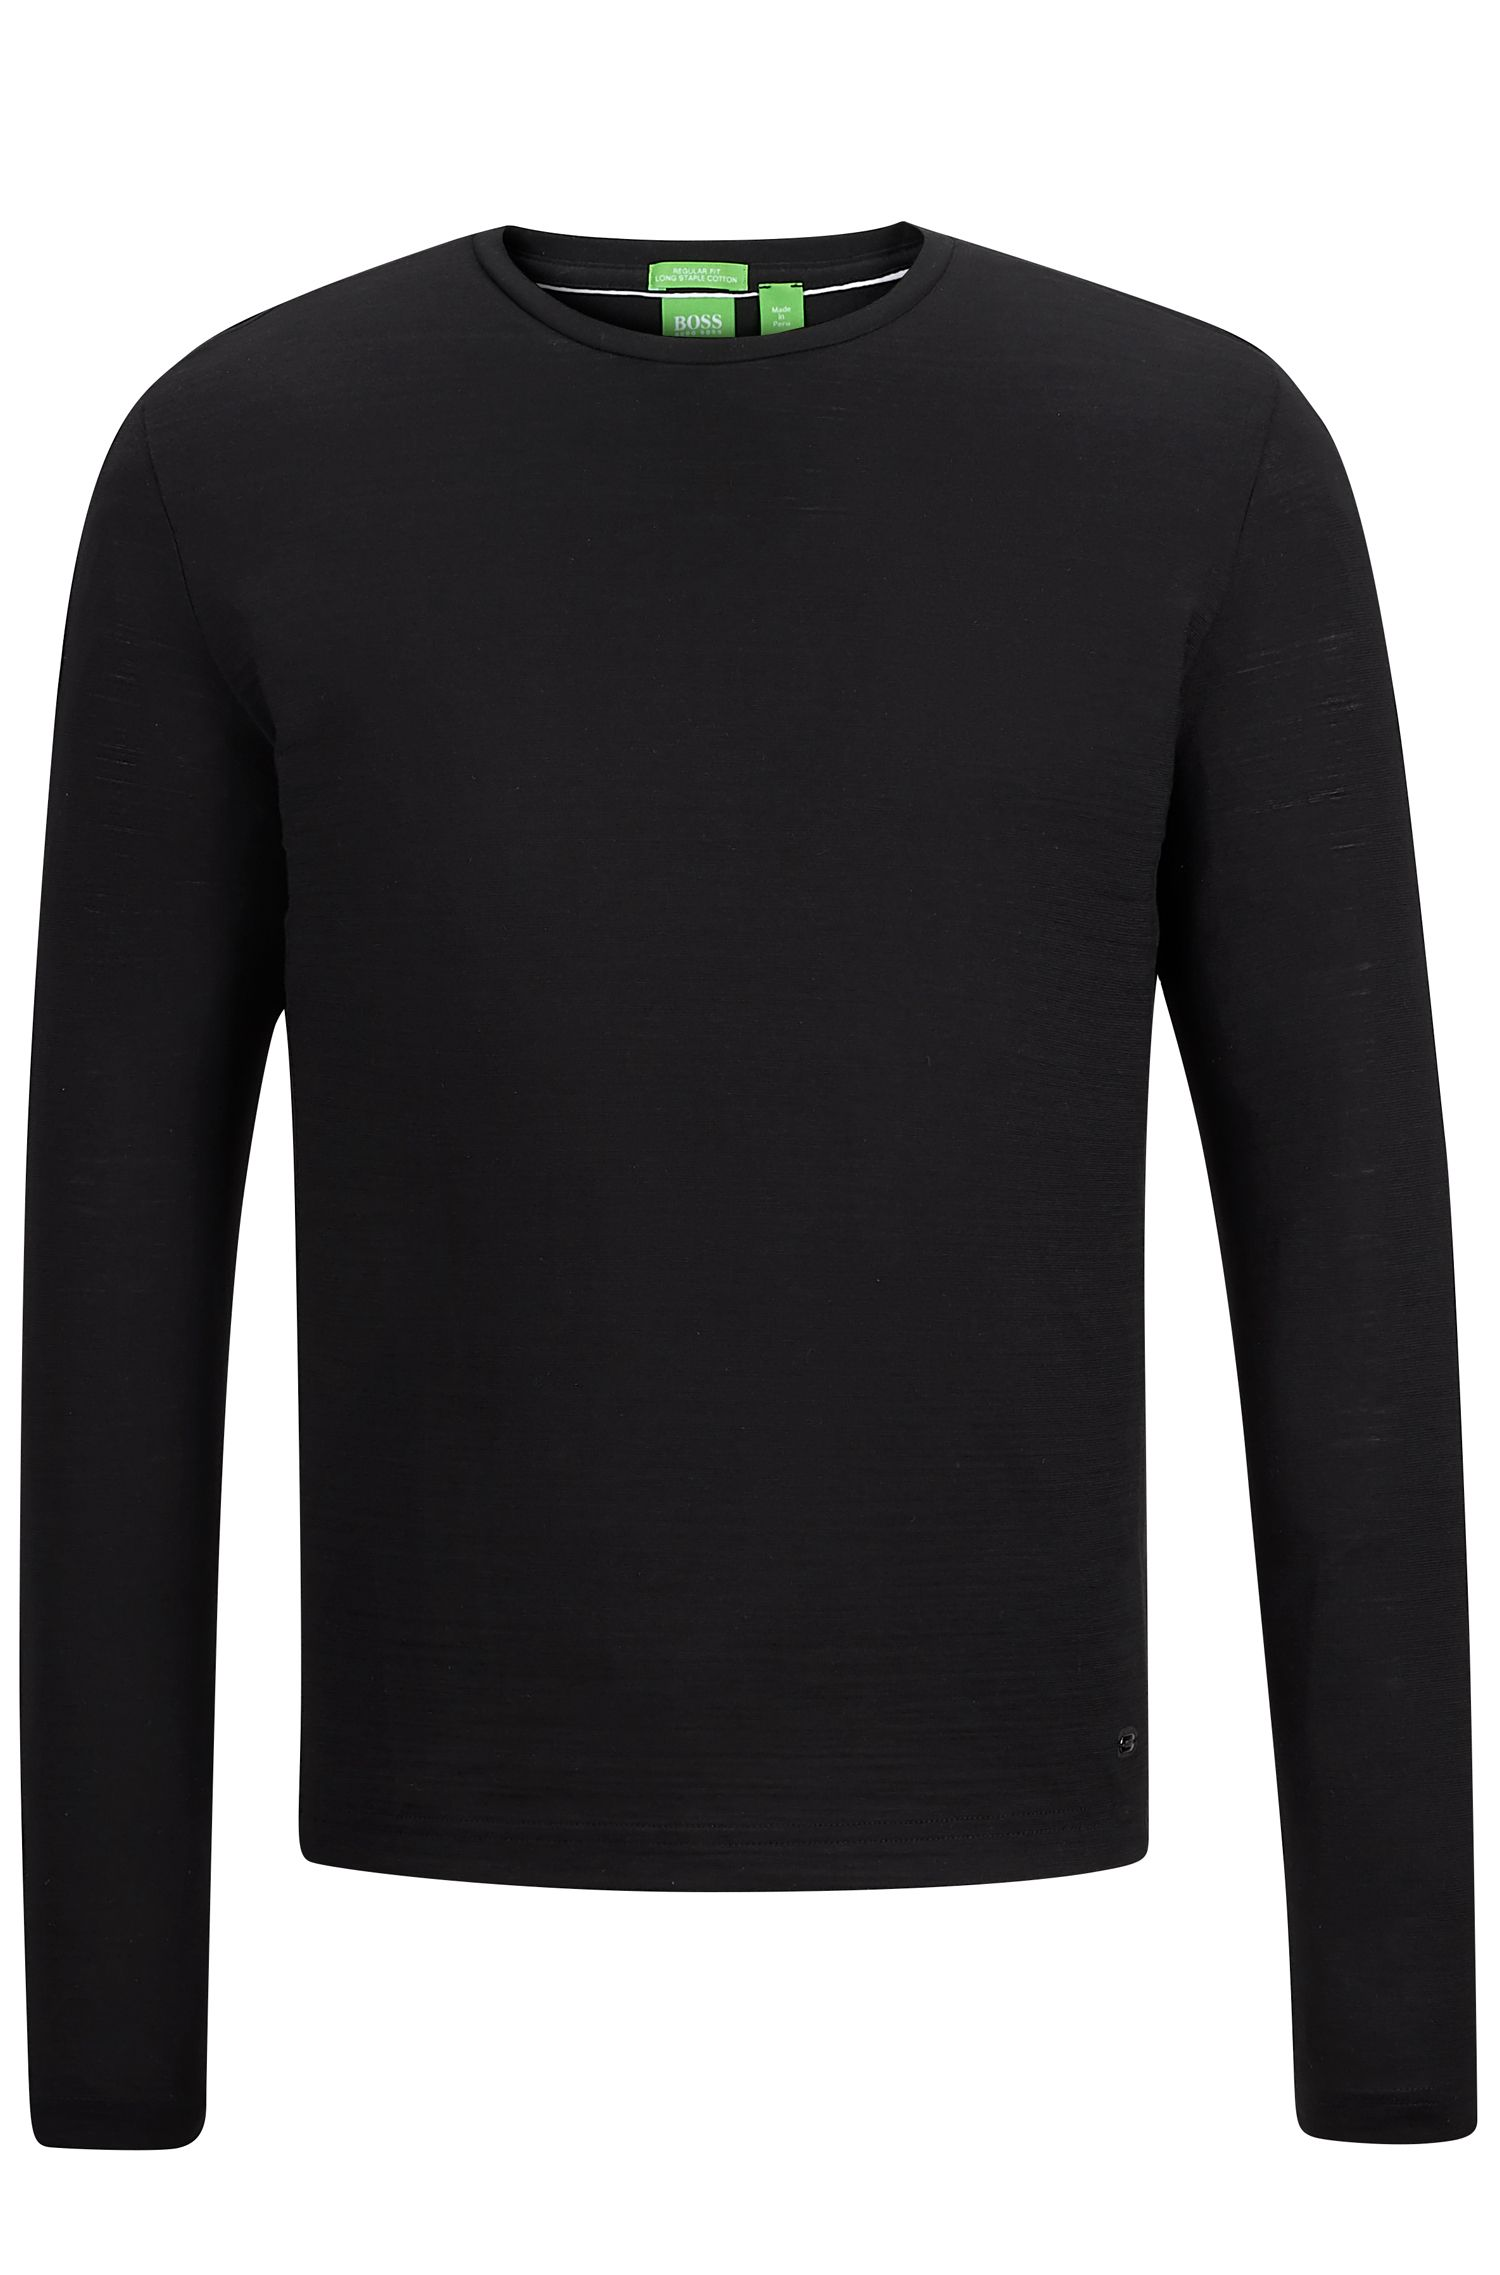 'Sassari US'   Cotton Long Sleeve T-Shirt